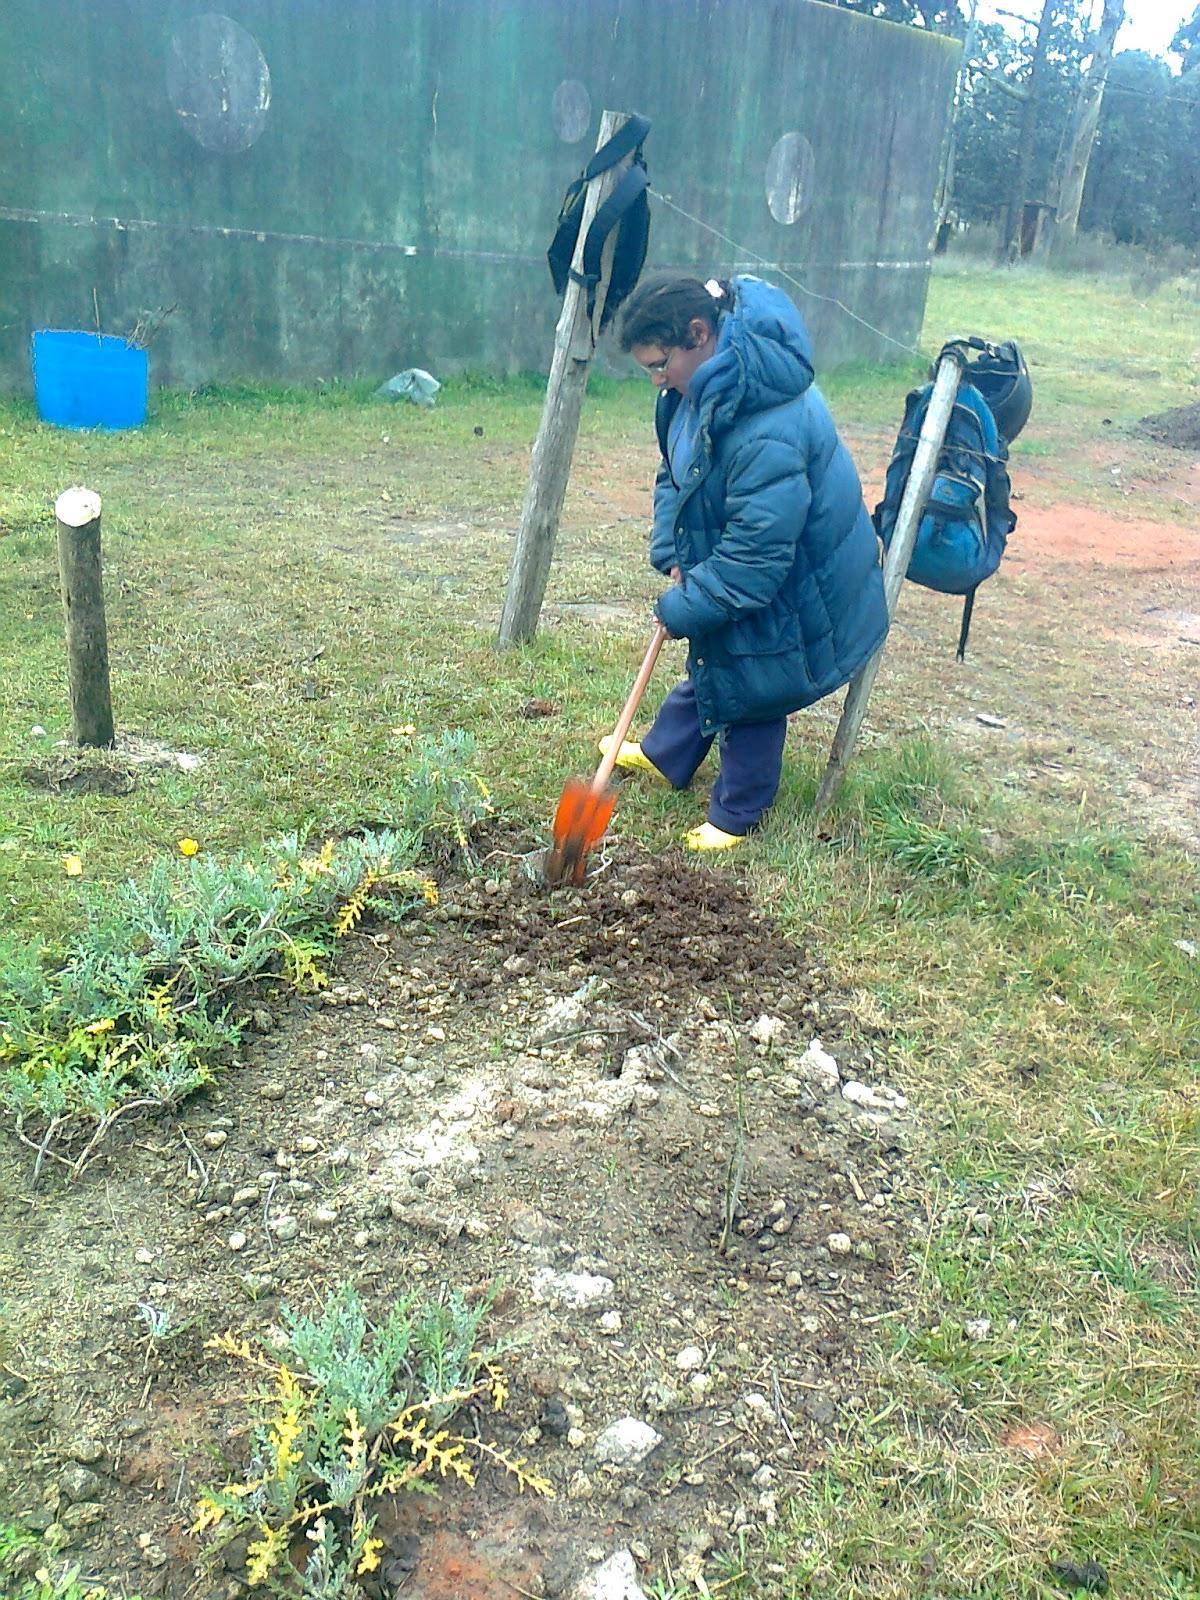 Curso jardiner a utu atl ntida for Curso jardineria